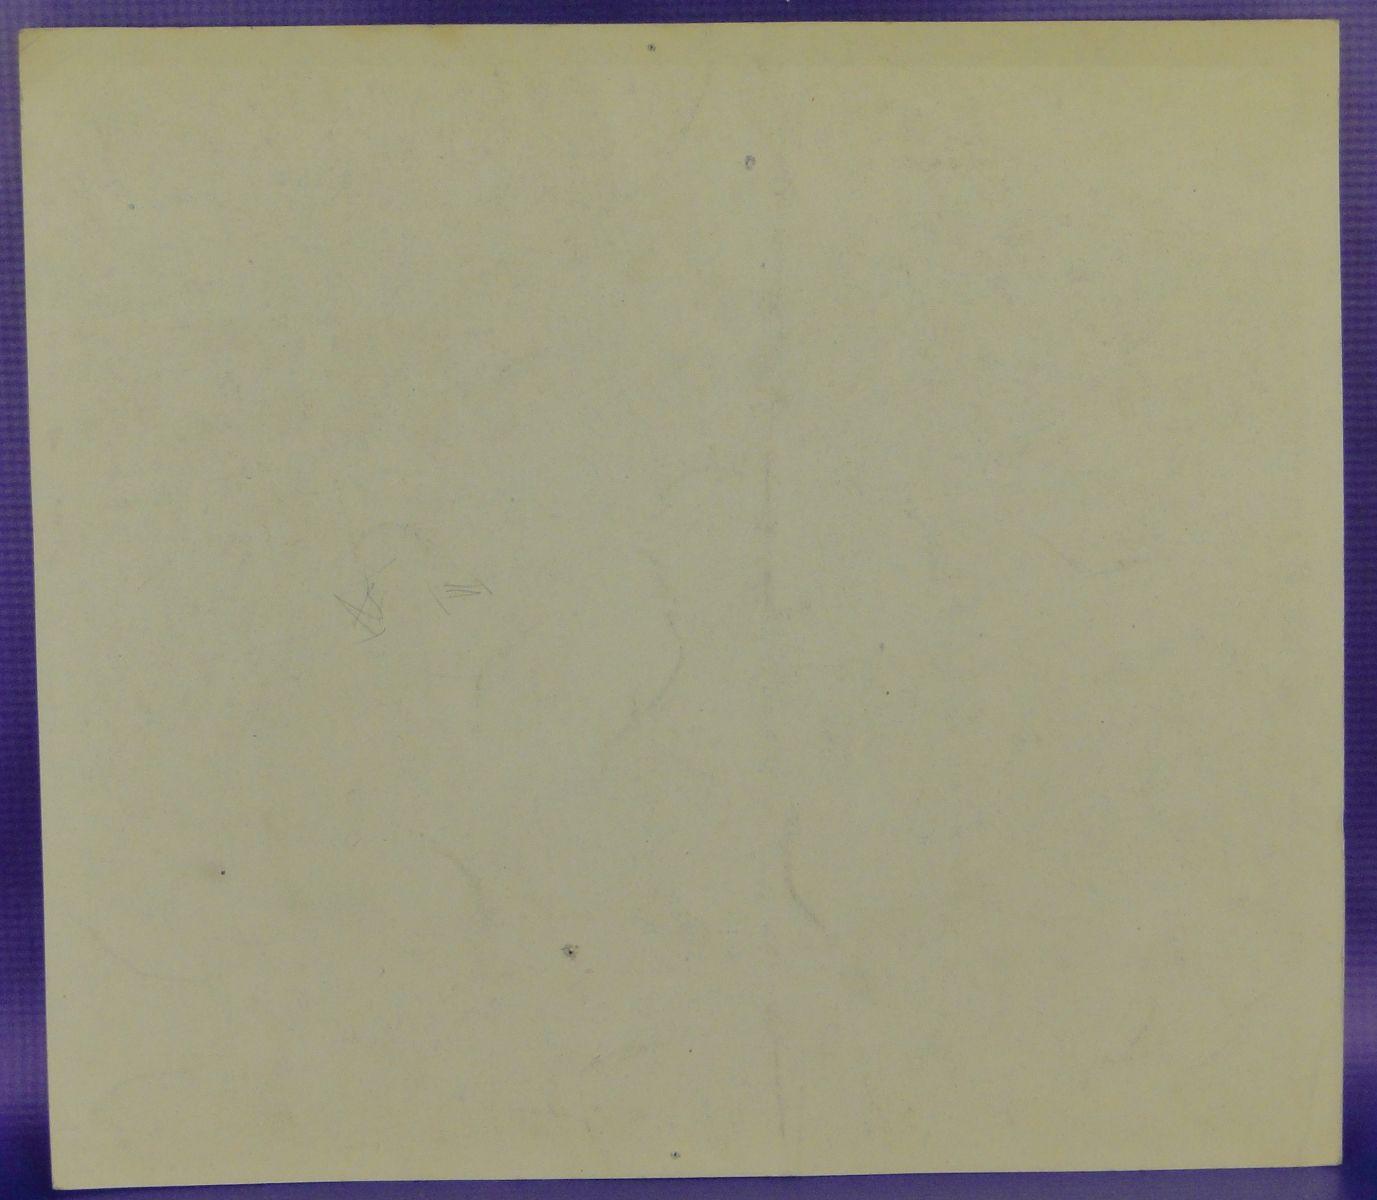 DSC01862.JPG (1377×1200)